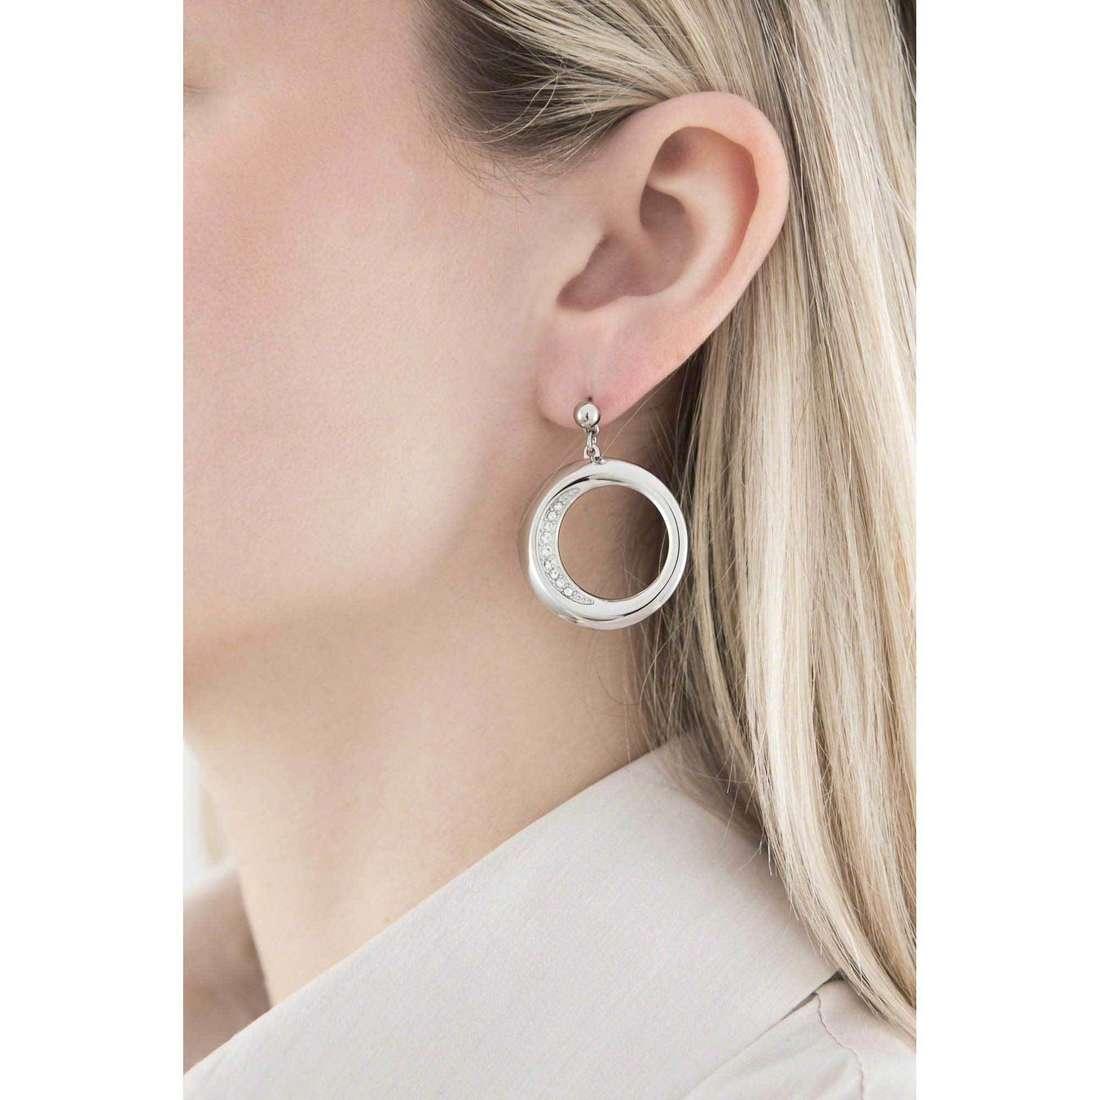 Morellato boucles d'oreille Notti femme SAAH06 indosso